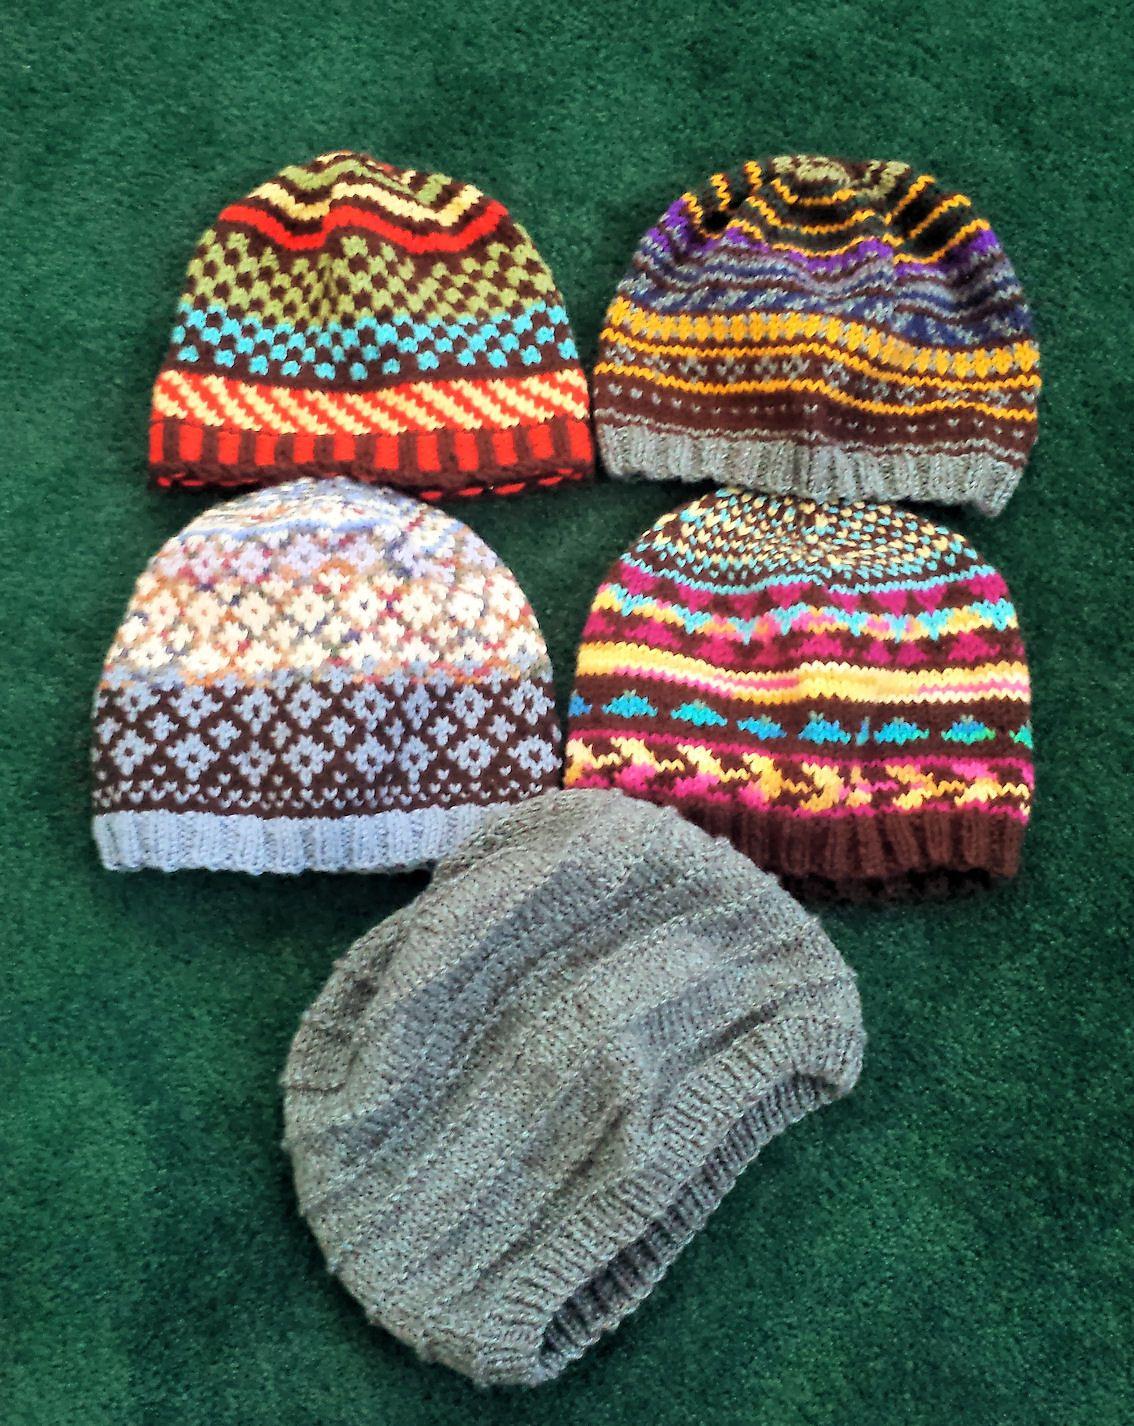 Ravelry: Basic Knit Hat by Cynthia Miller | Knitting ...